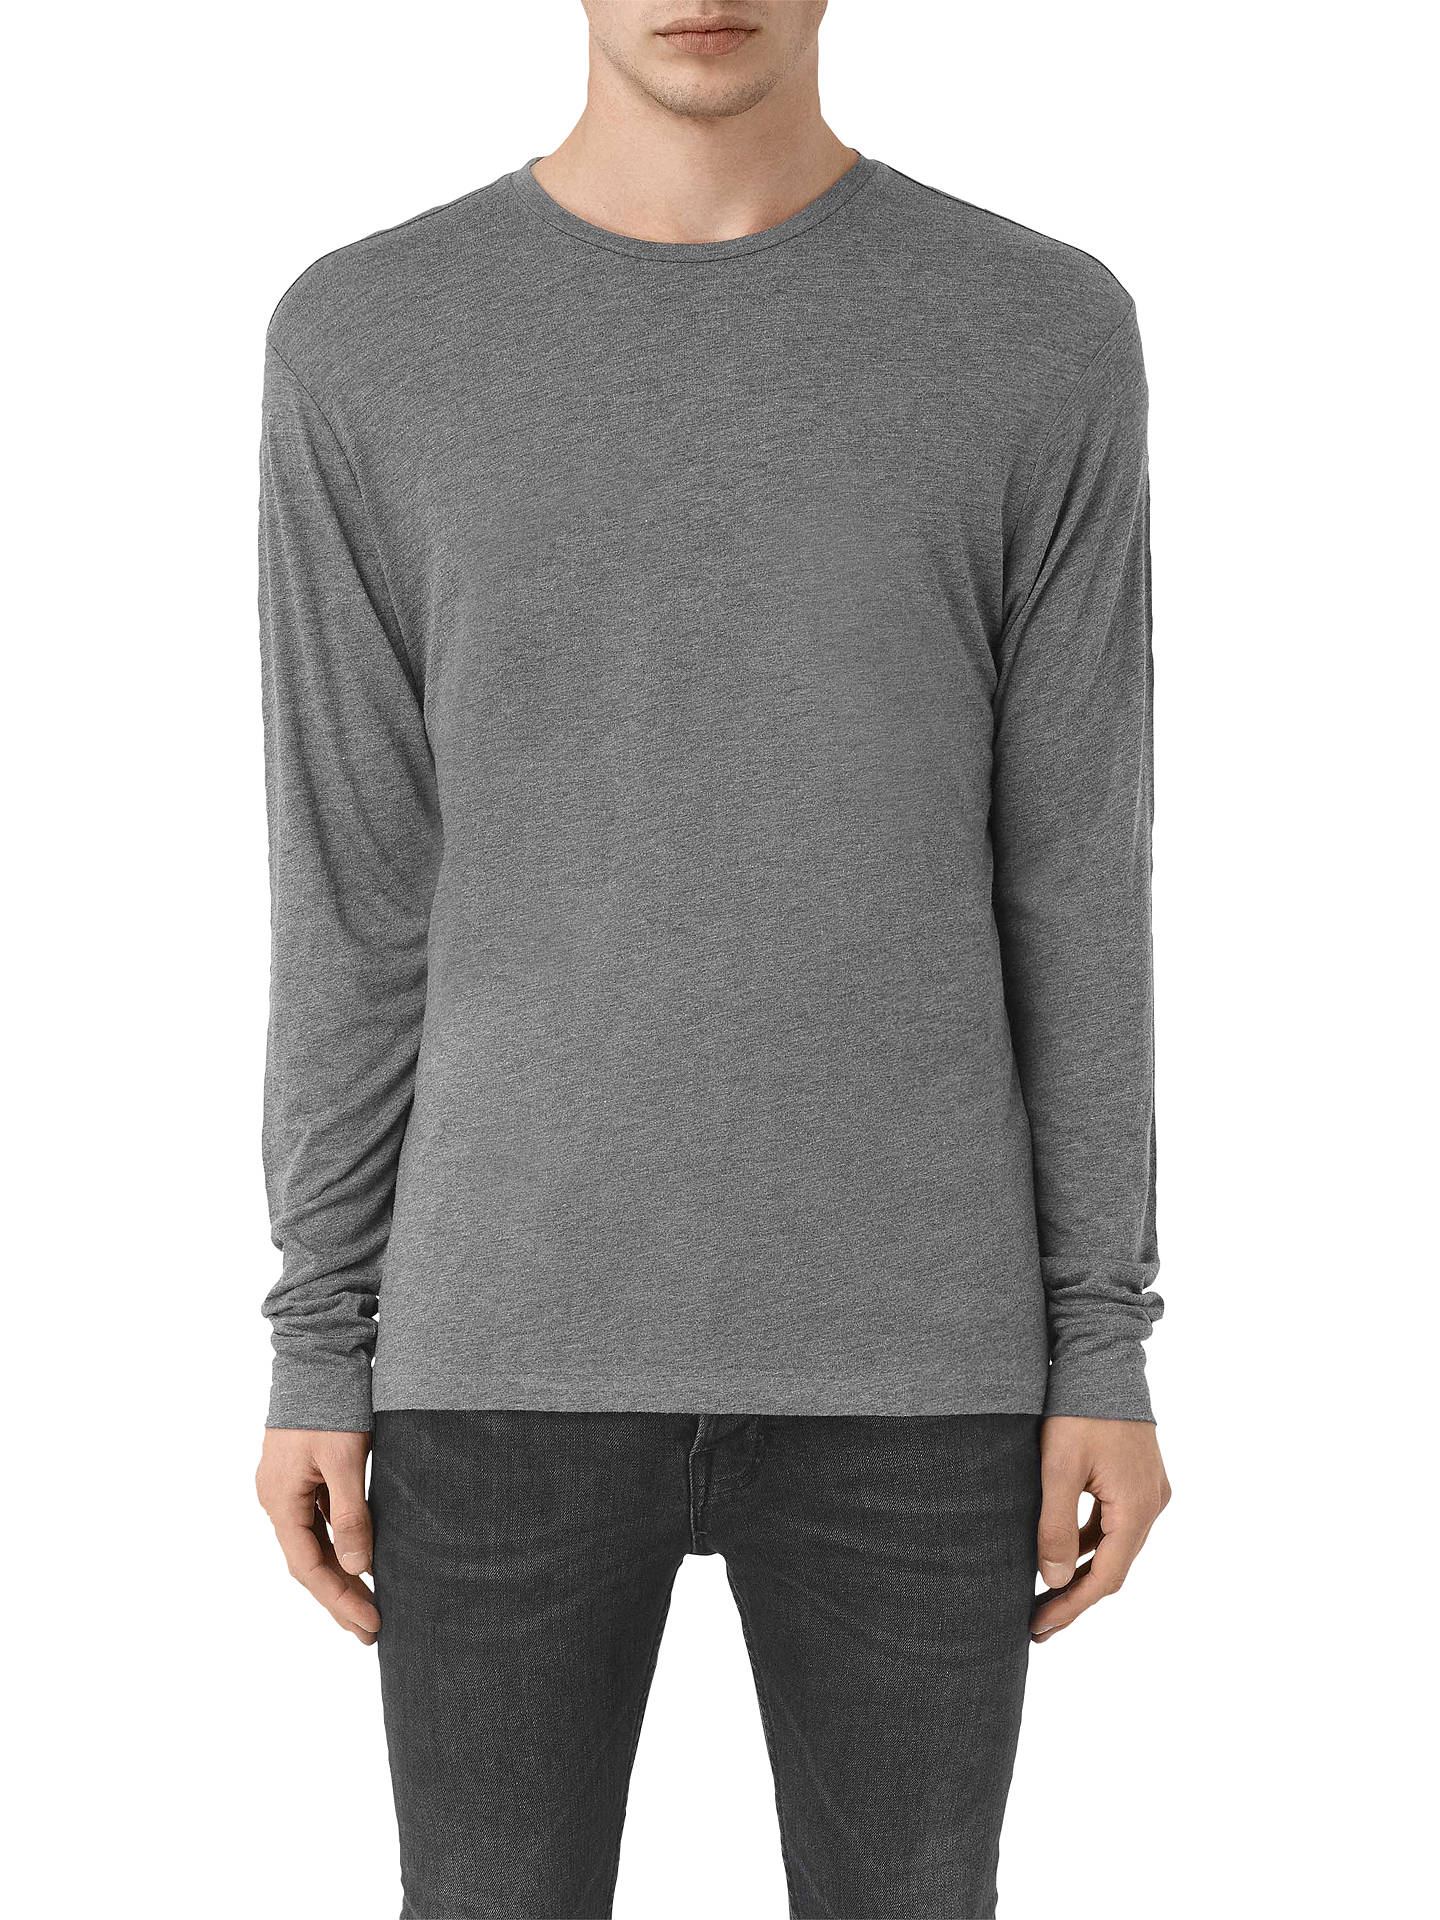 T Neck At Charcoal Shirt Marl Crew Sleeve Long Cedarn Allsaints pAxq6X1X